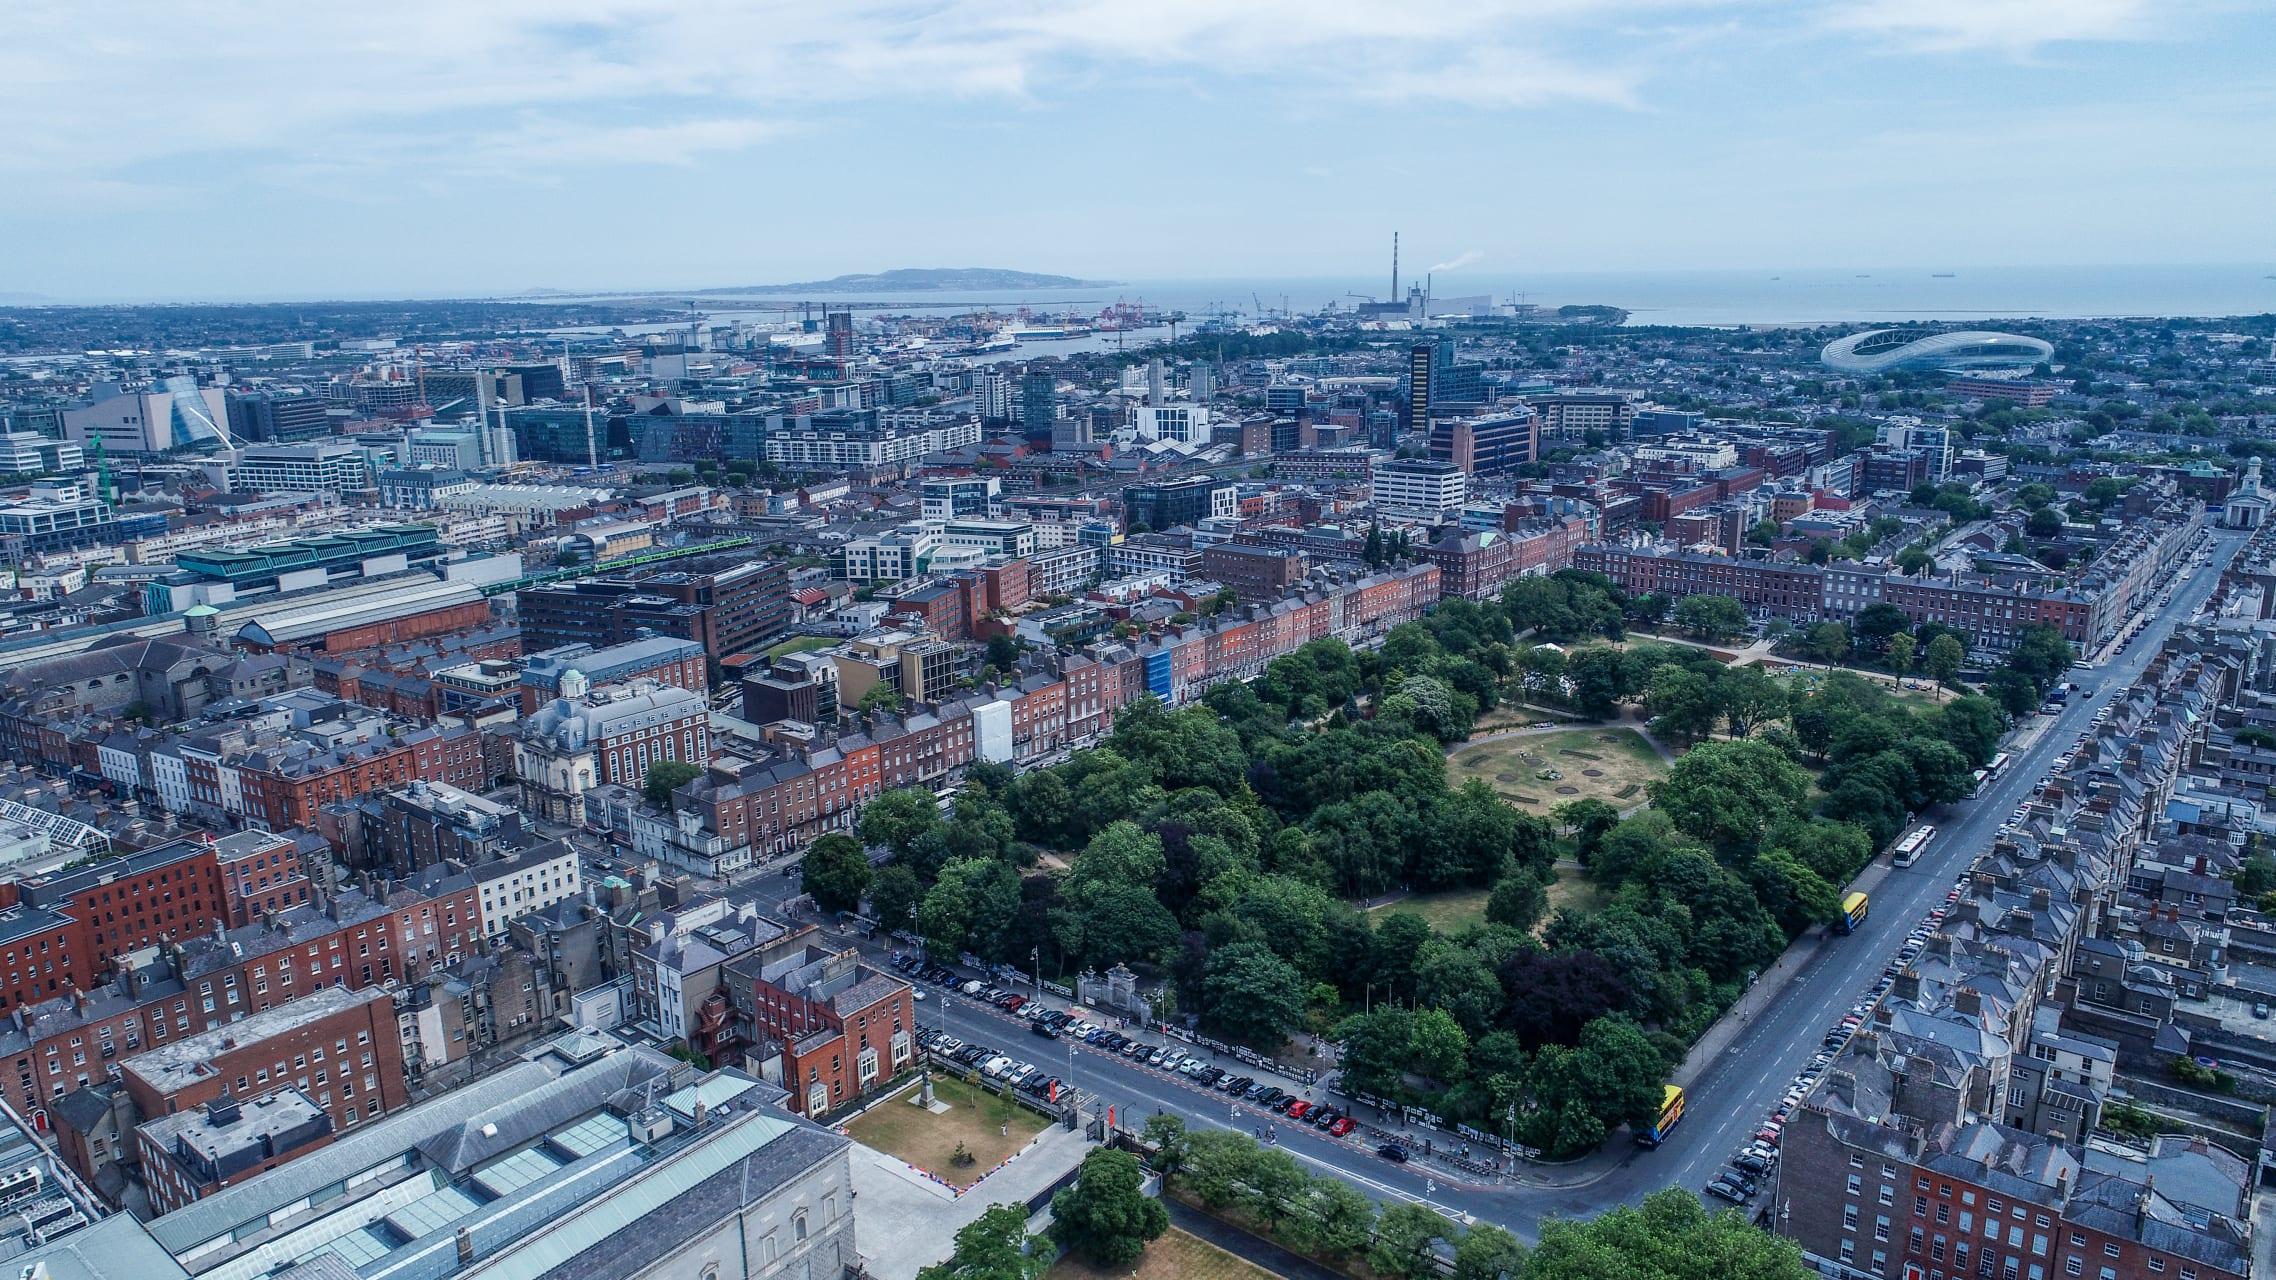 County Dublin - Dublin Rogues Tour featuring Merrion Square